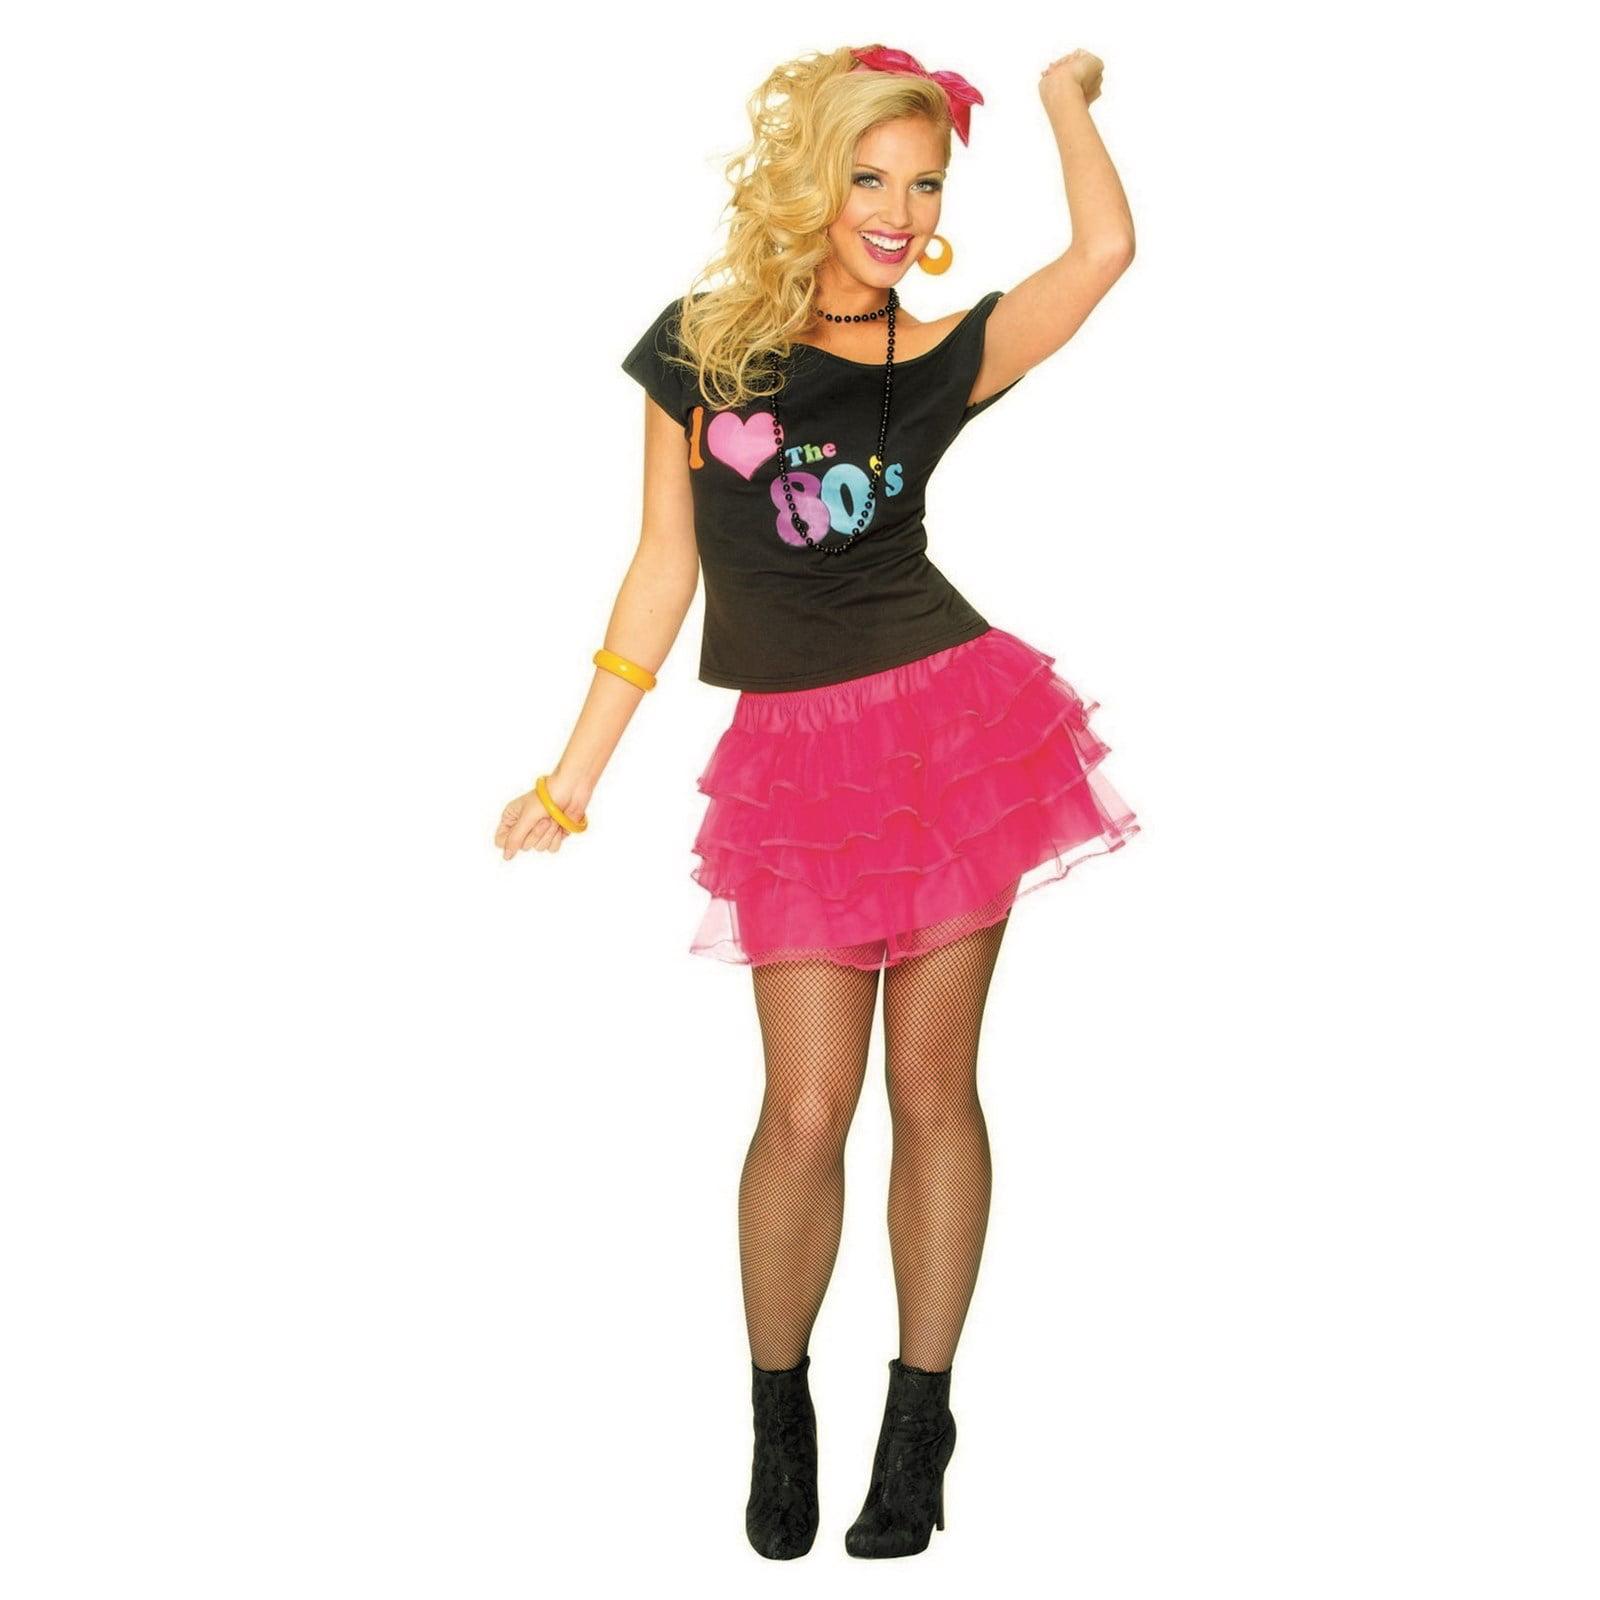 Women's Hot Pink 80s Petticoat Halloween Costume Accessory